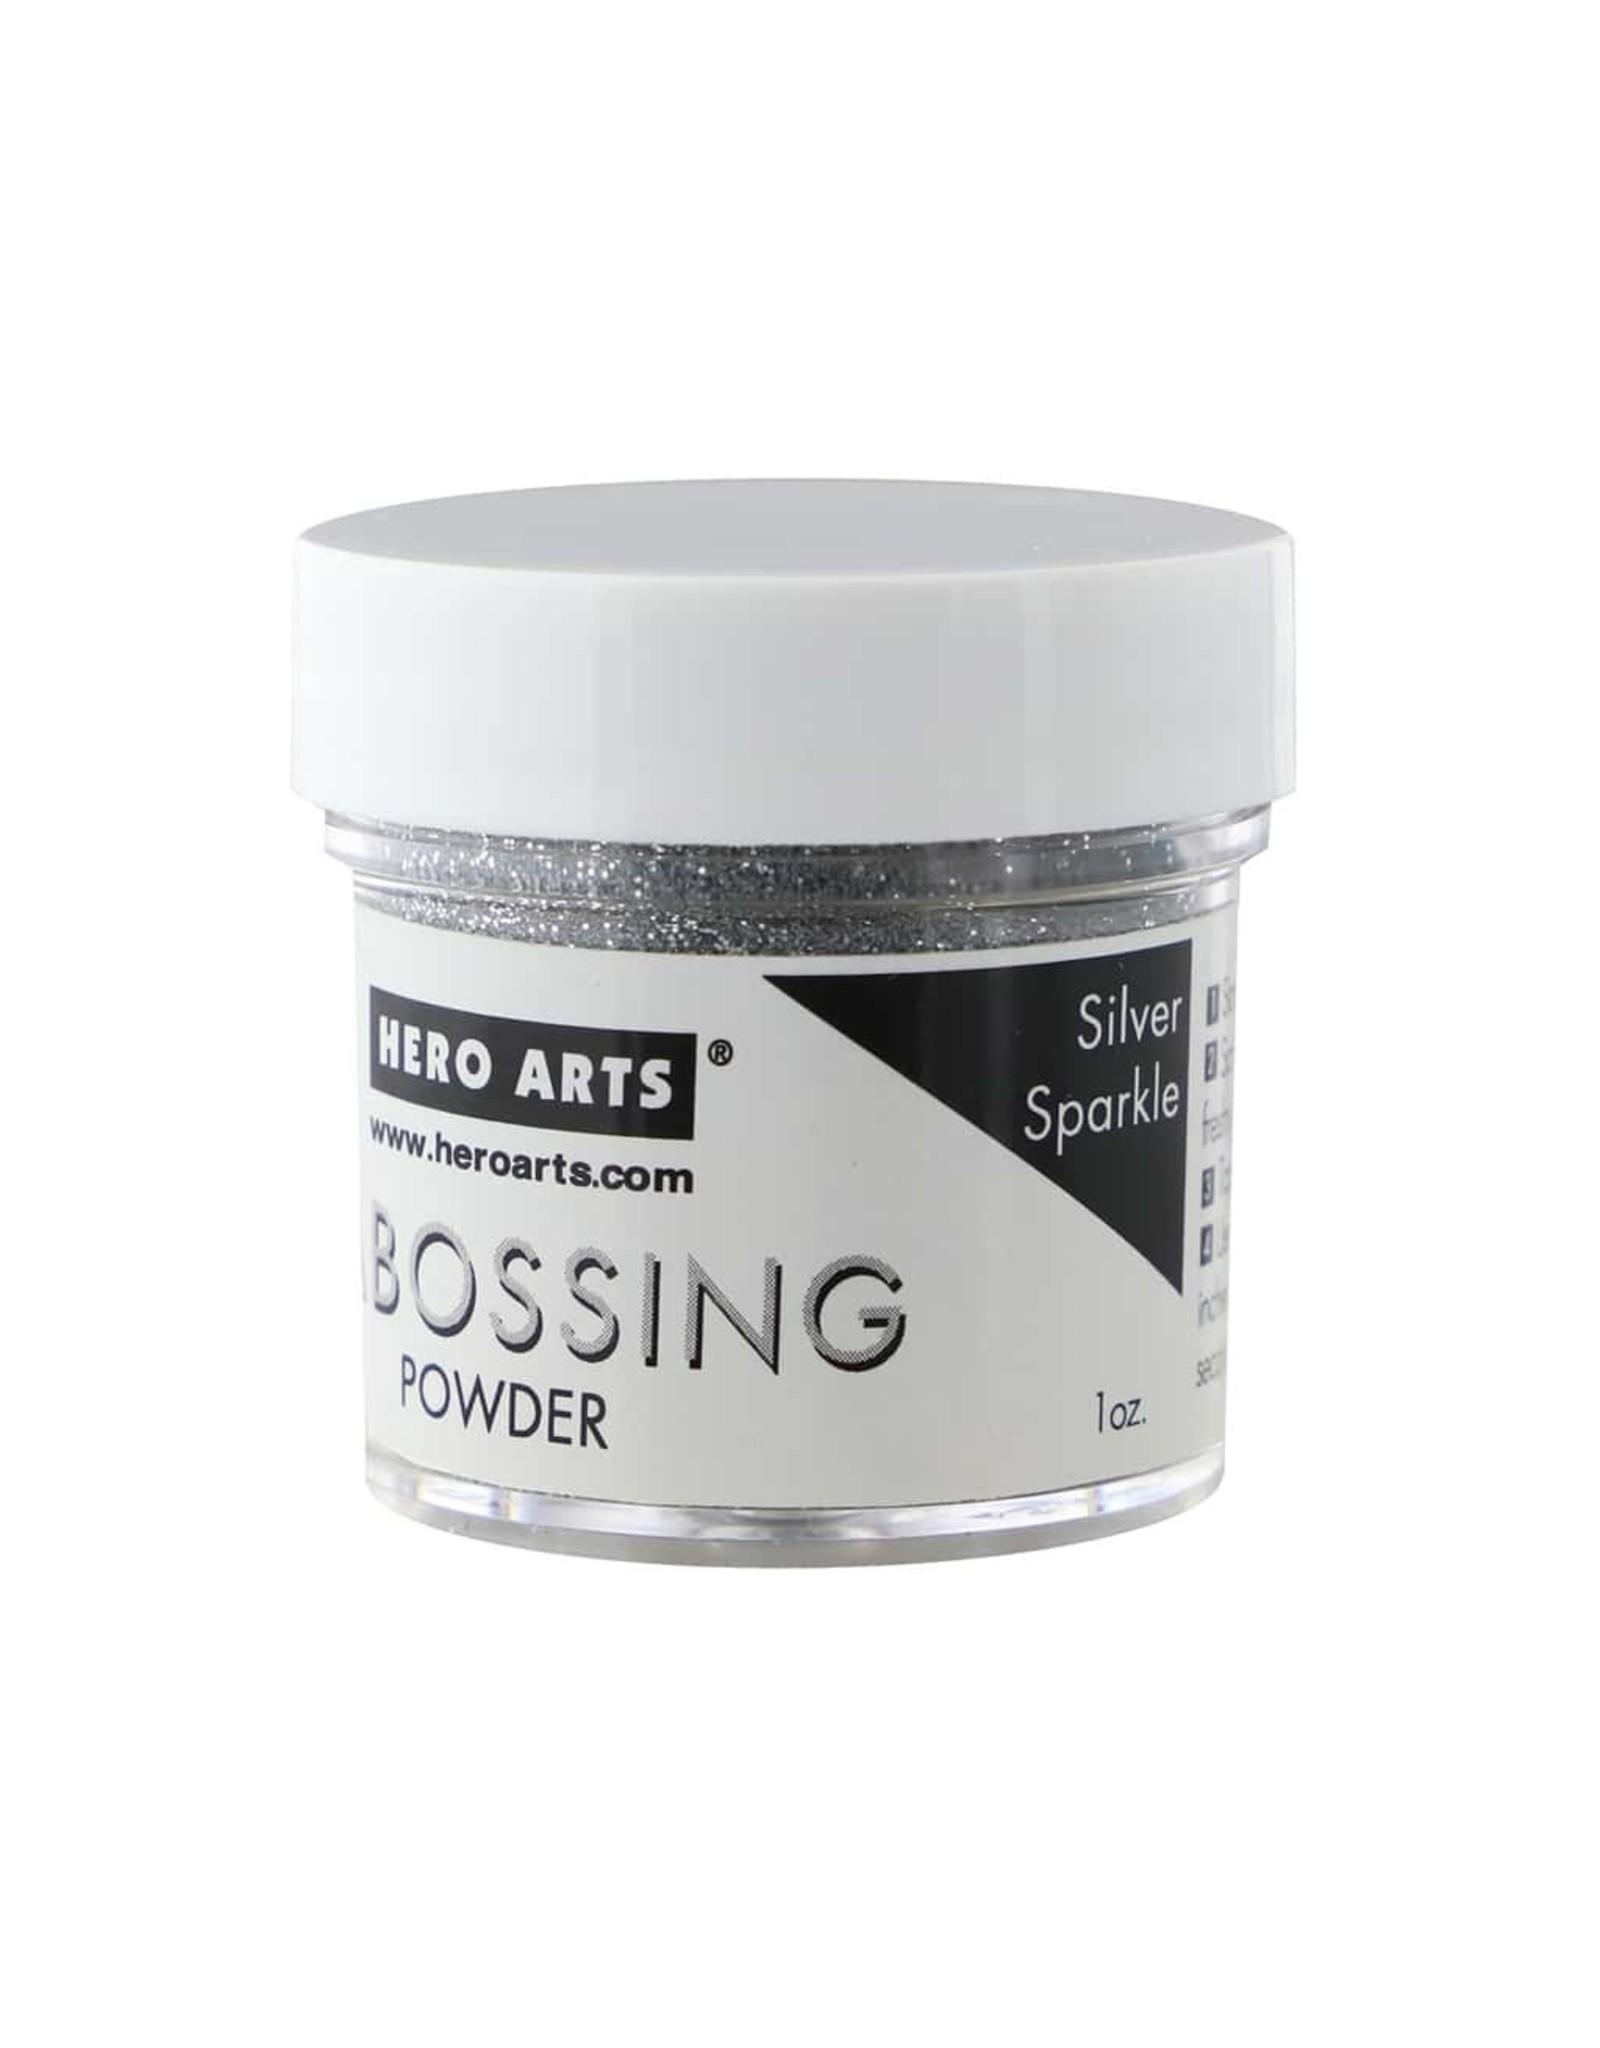 Hero Arts Hero Arts Embossing Powder - Silver Sparkle